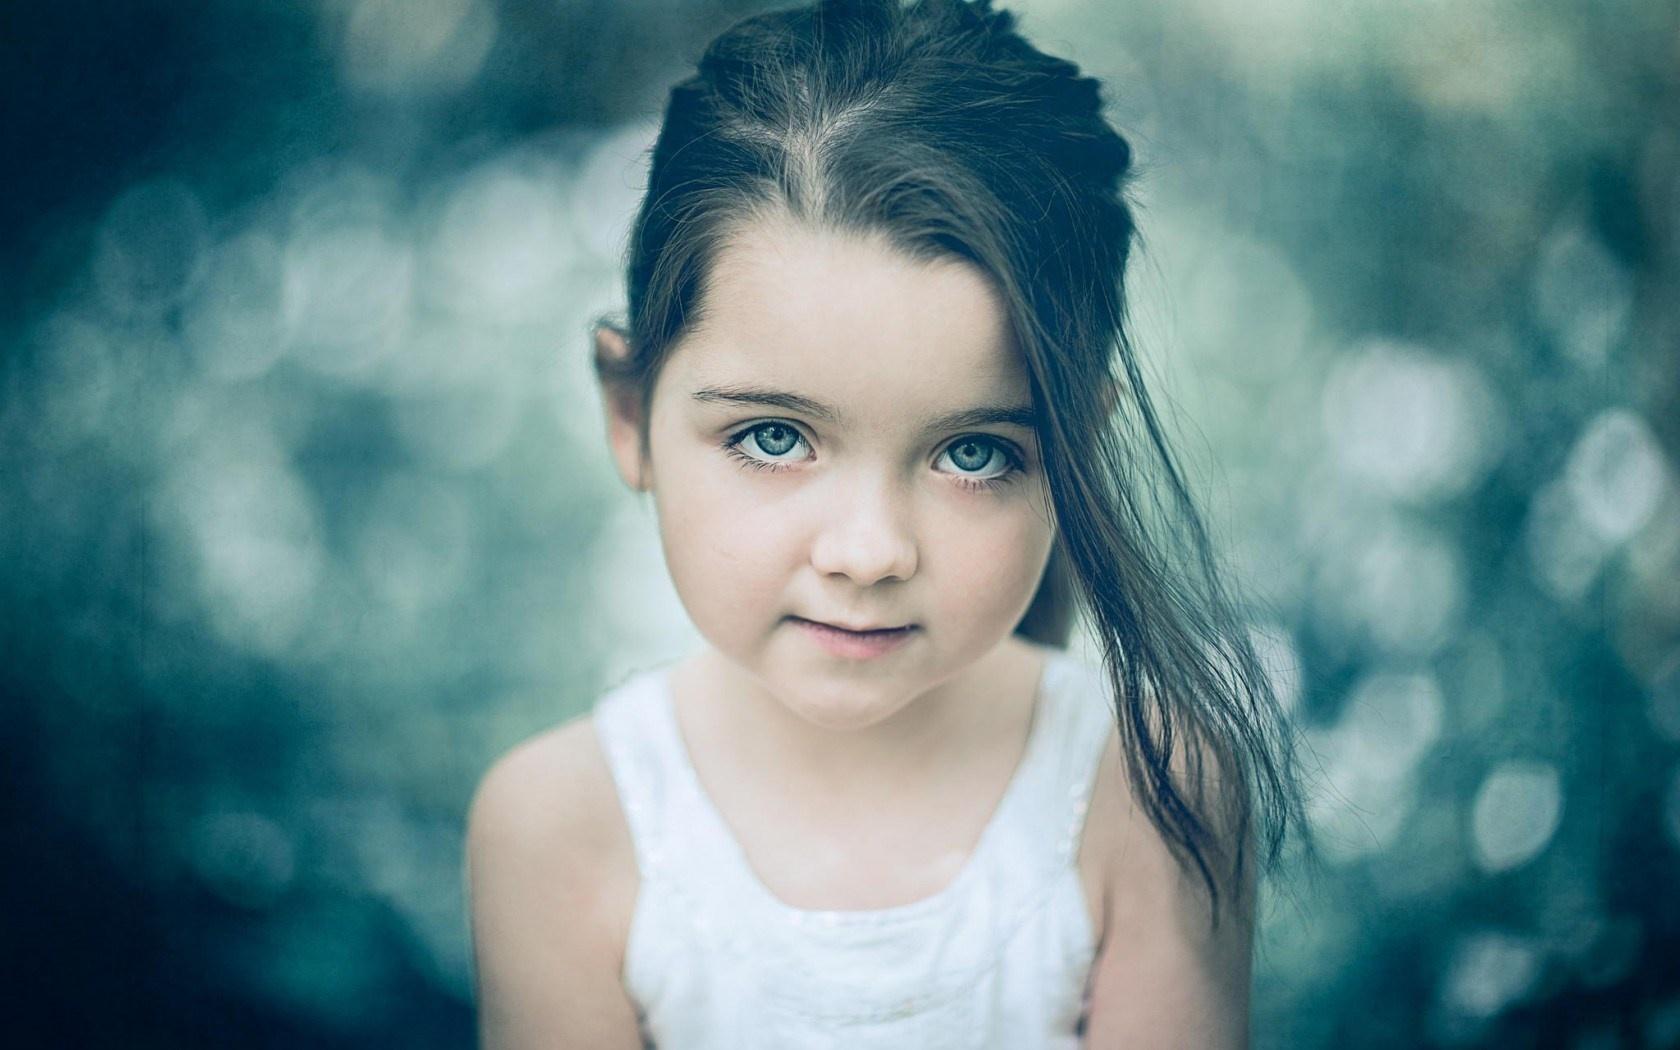 Cute Kid Girl HD Wallpaper   Stylish HD Wallpapers 1680x1050